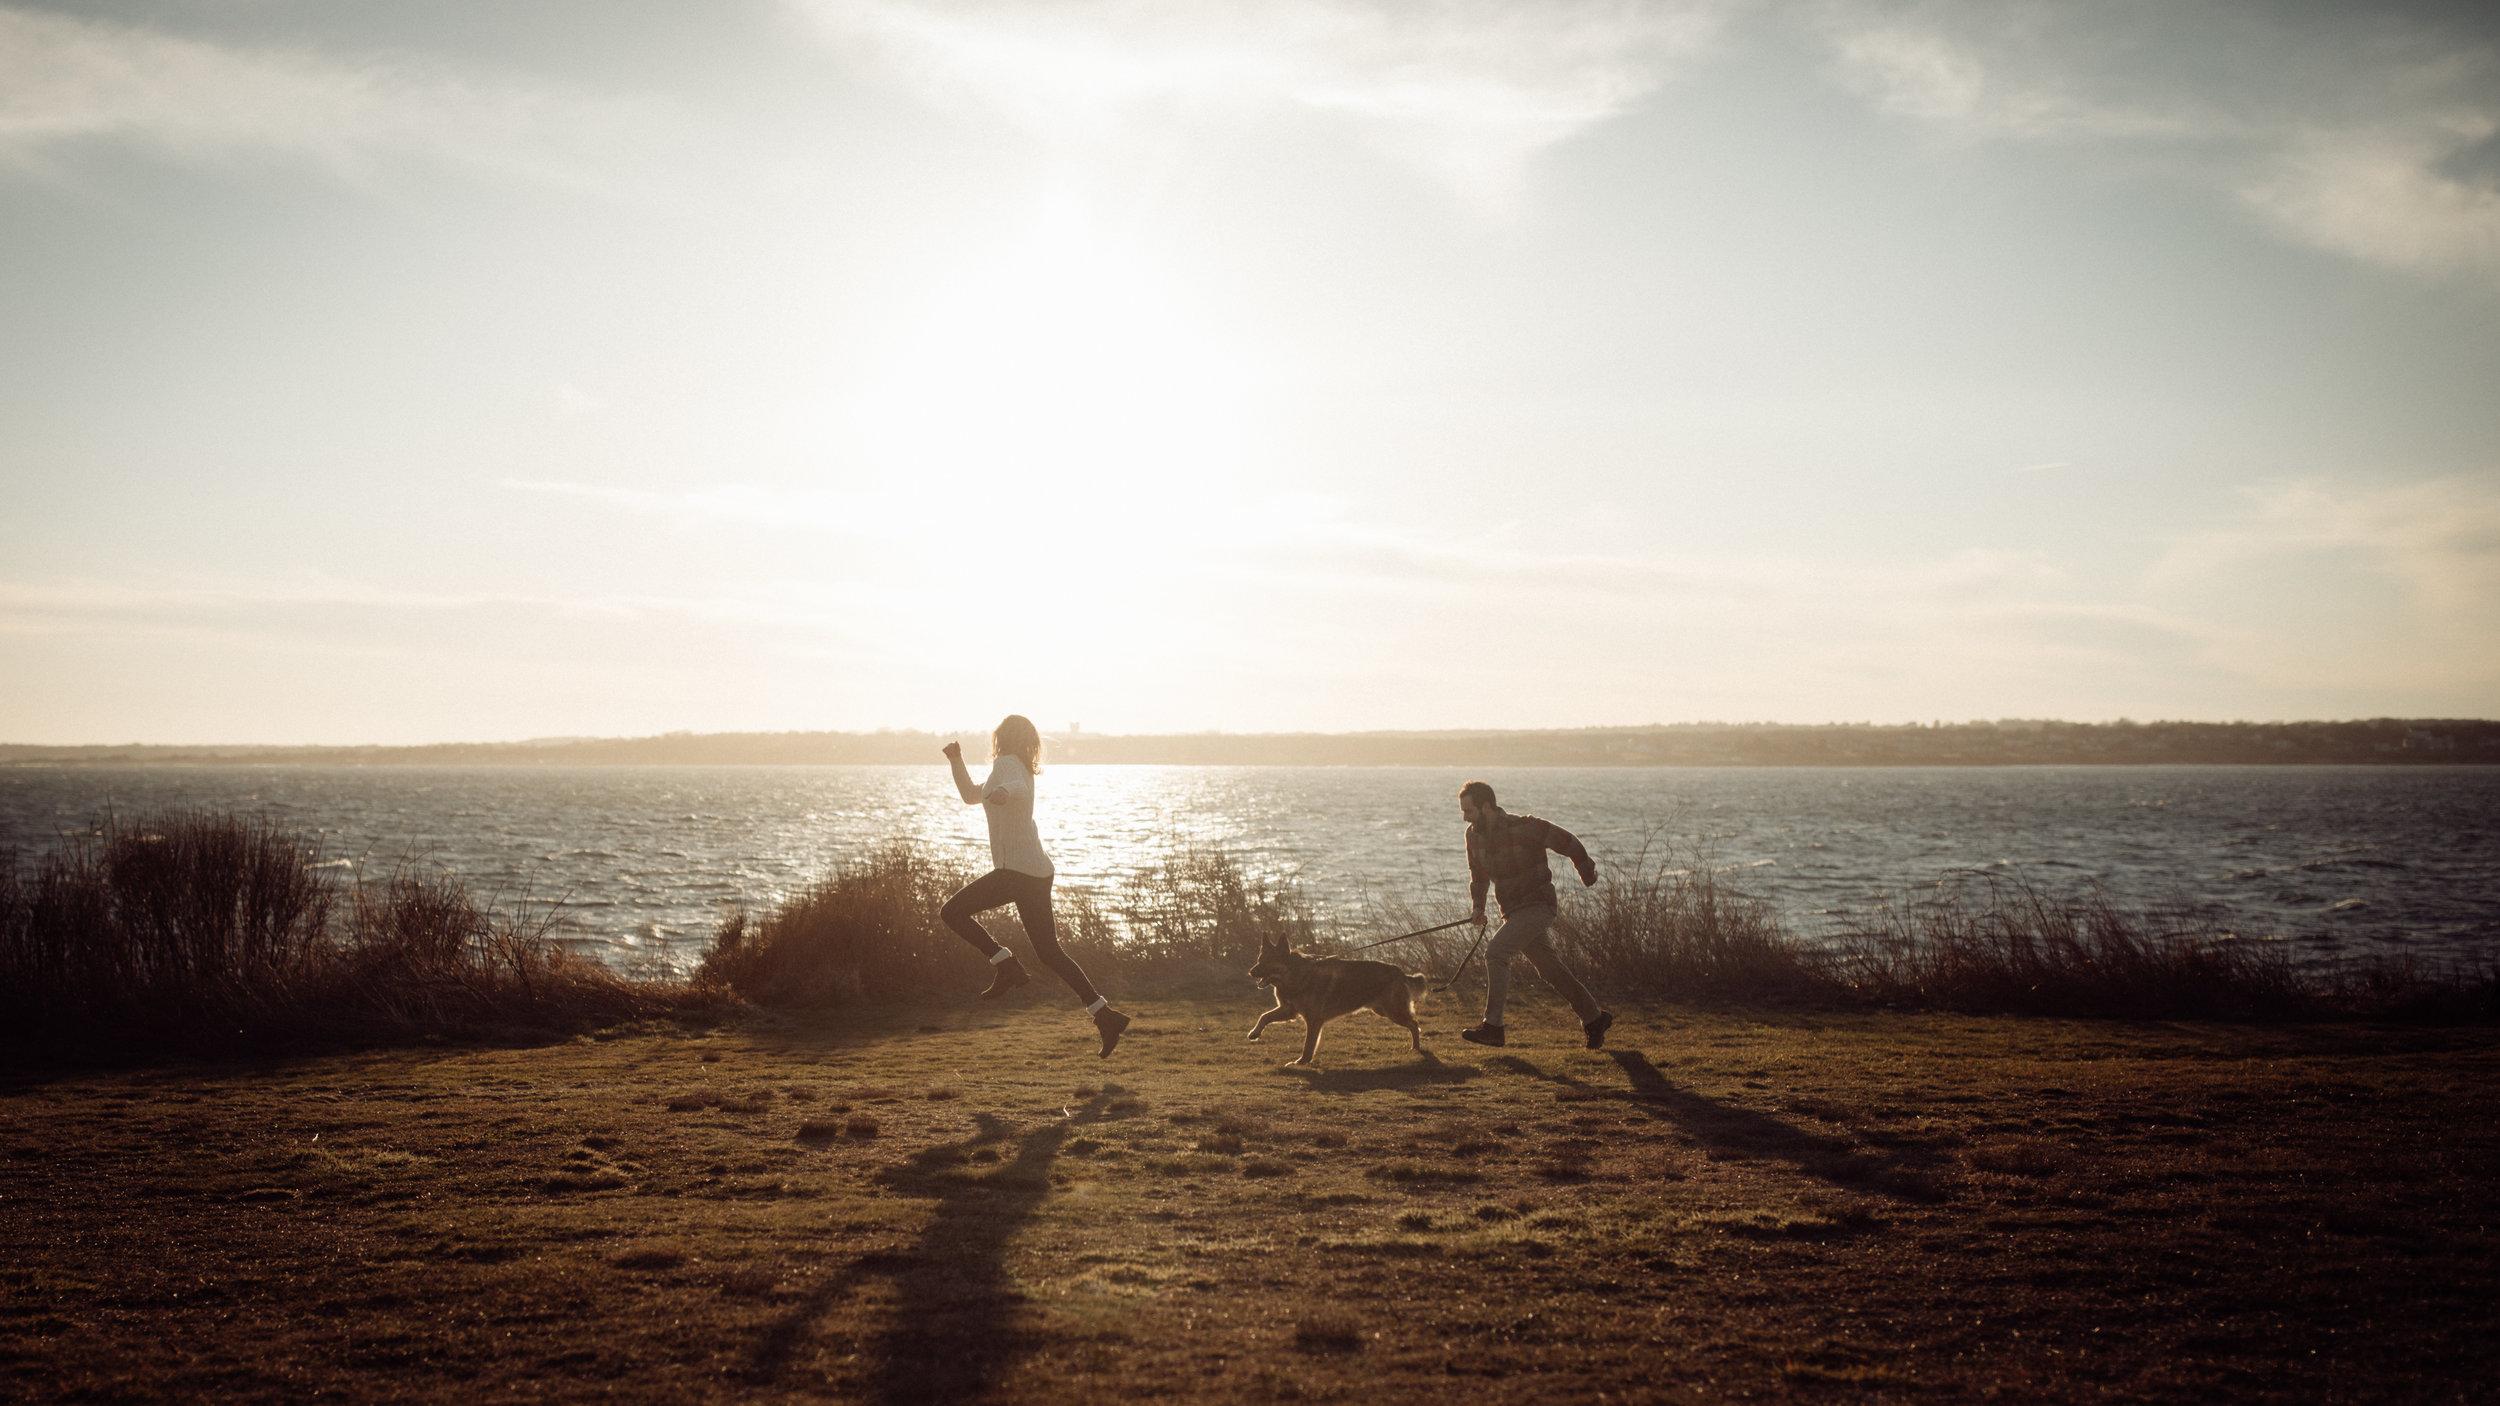 tonya-merke-photography-adventure-rhode-island-21.jpg